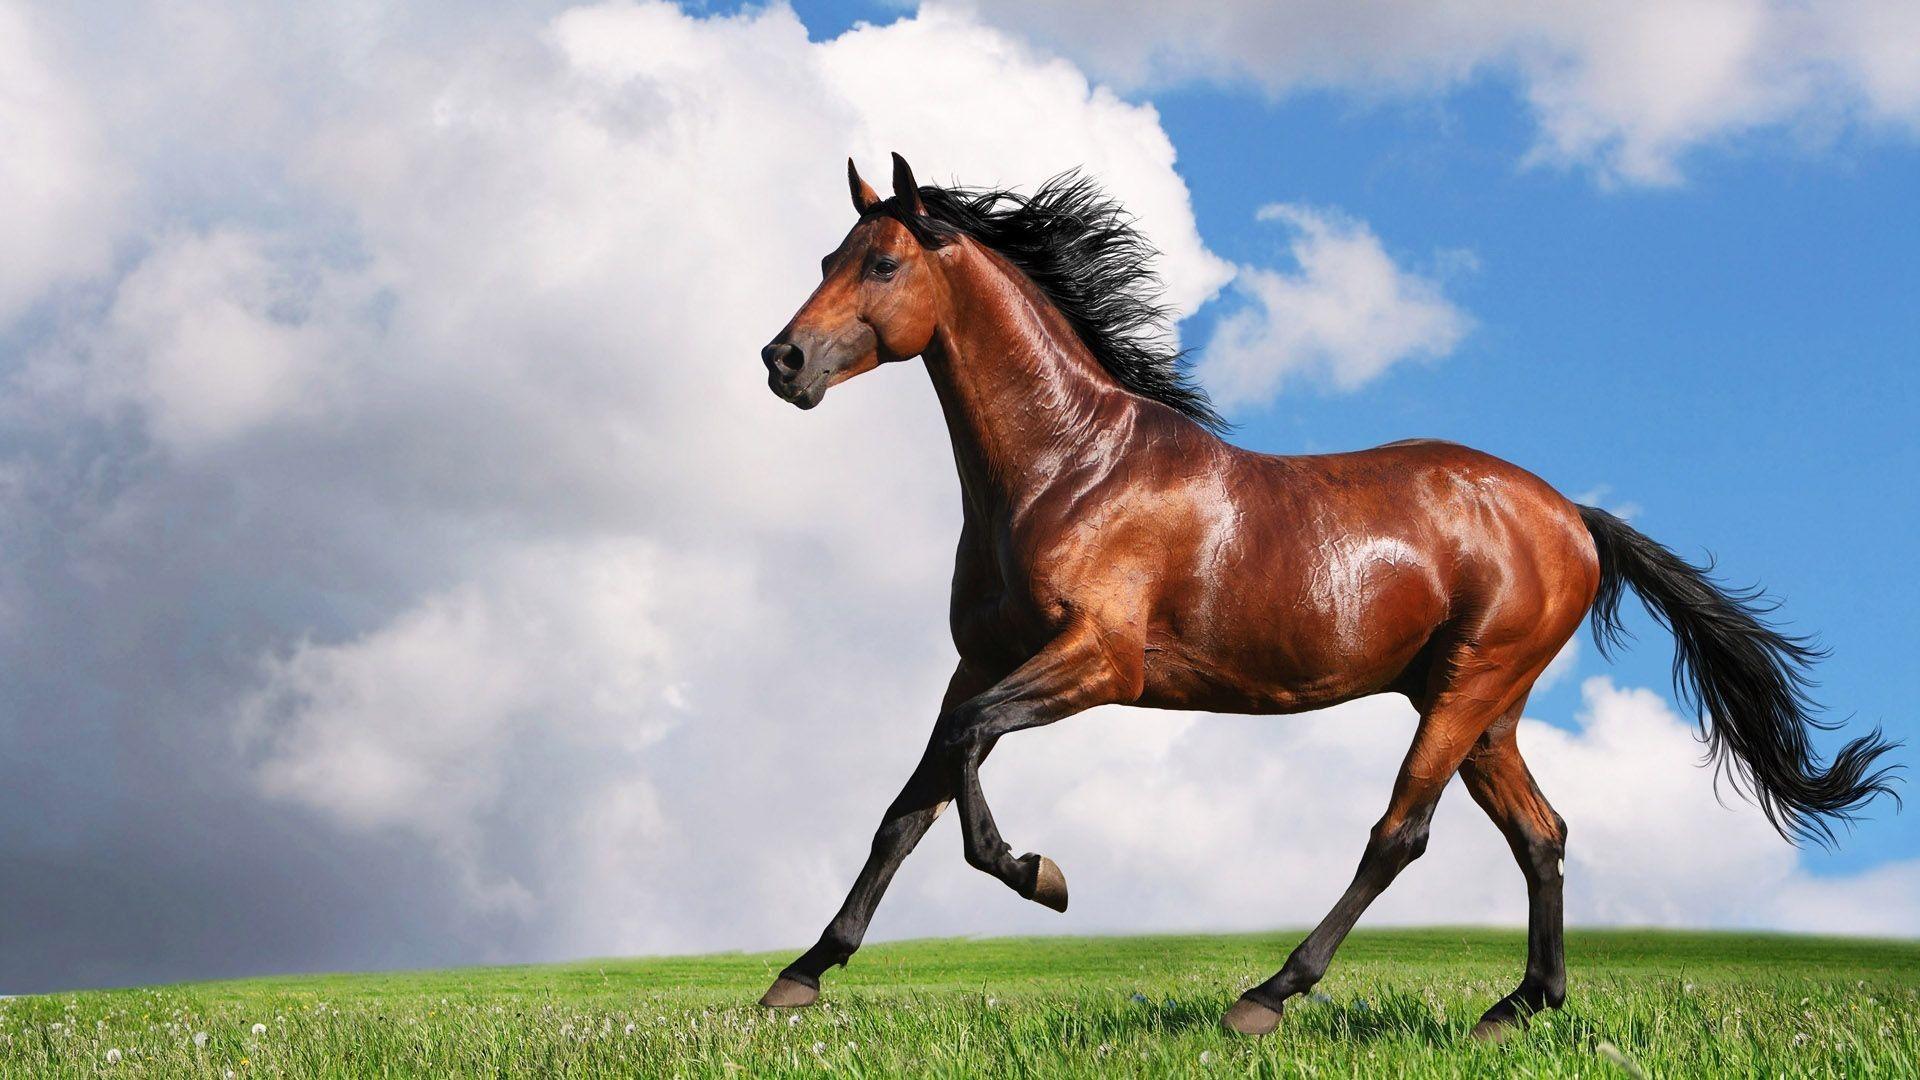 Awesome Chestnut Horse Wallpaper Hewan Kuda